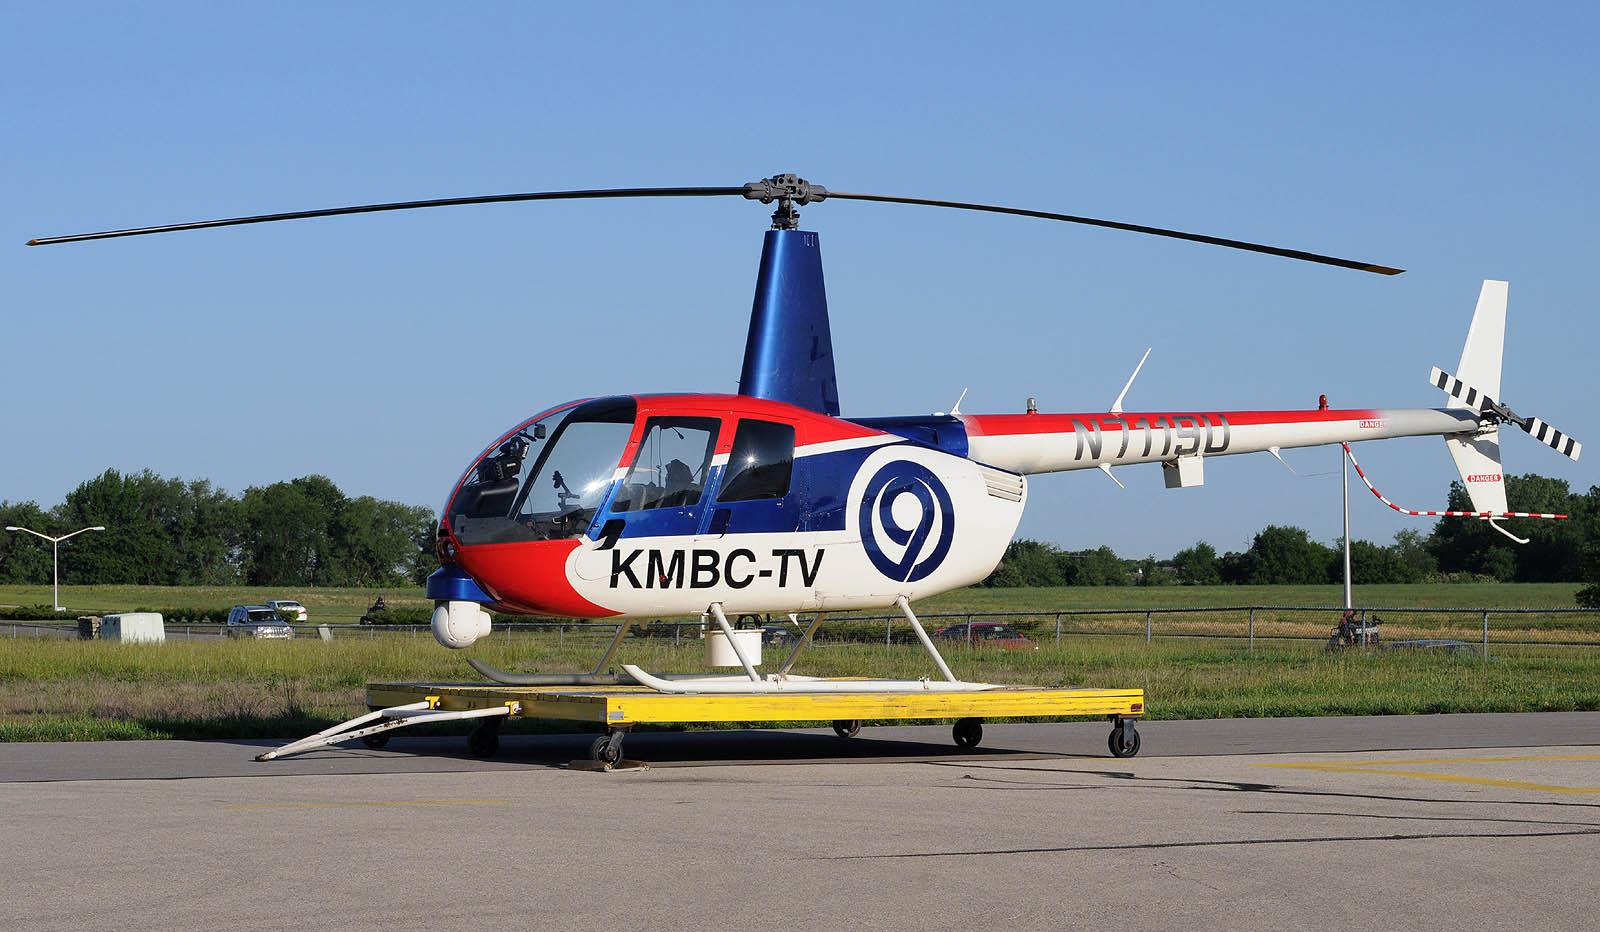 Sky Chopper KMBC 9 News